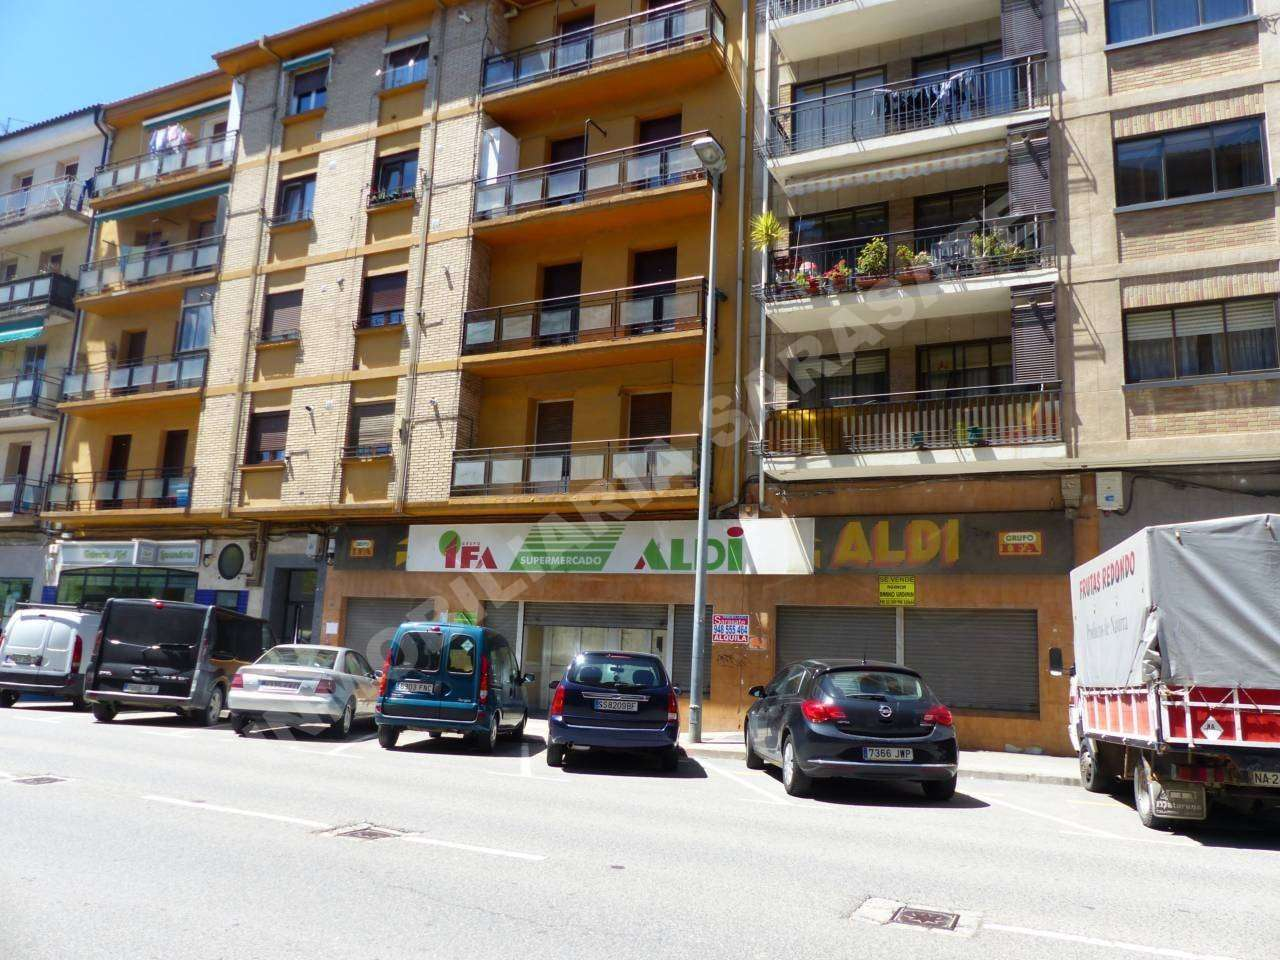 ALQUILER DE LOCAL EN AVD. YERRI, ESTELLA-LIZARRA | REF. (003771)